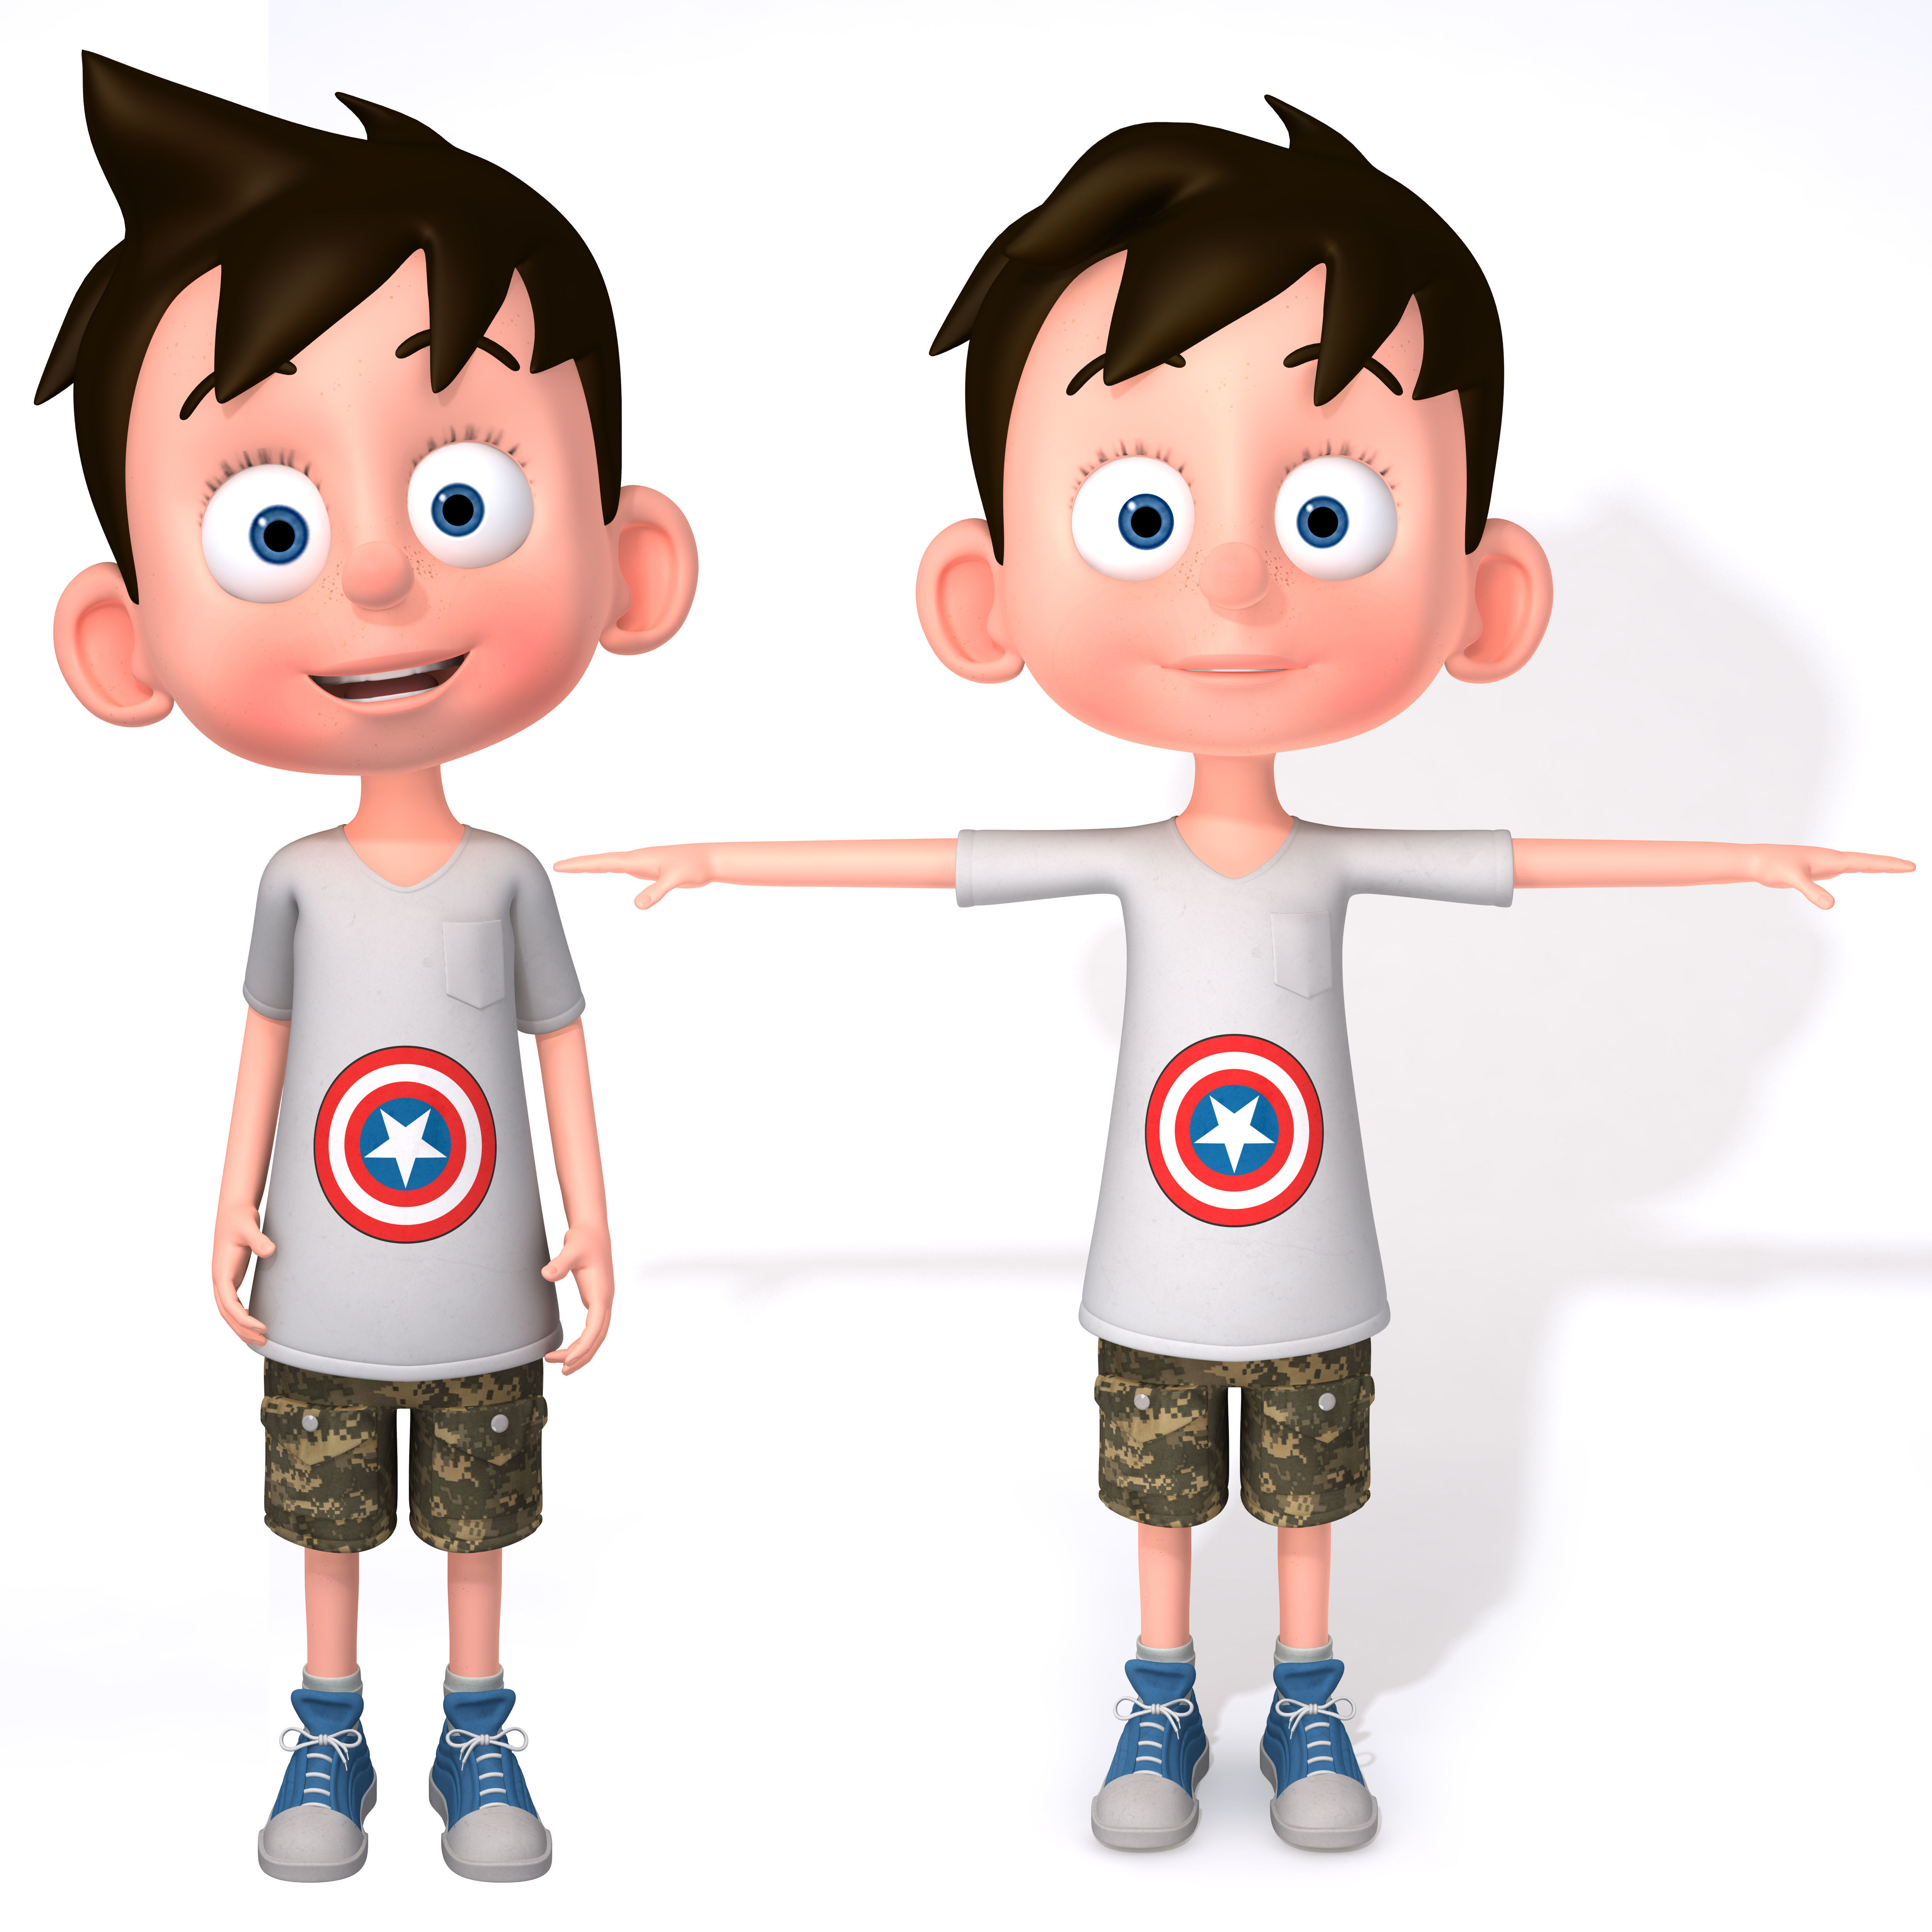 3D Cartoon Boy Rigged